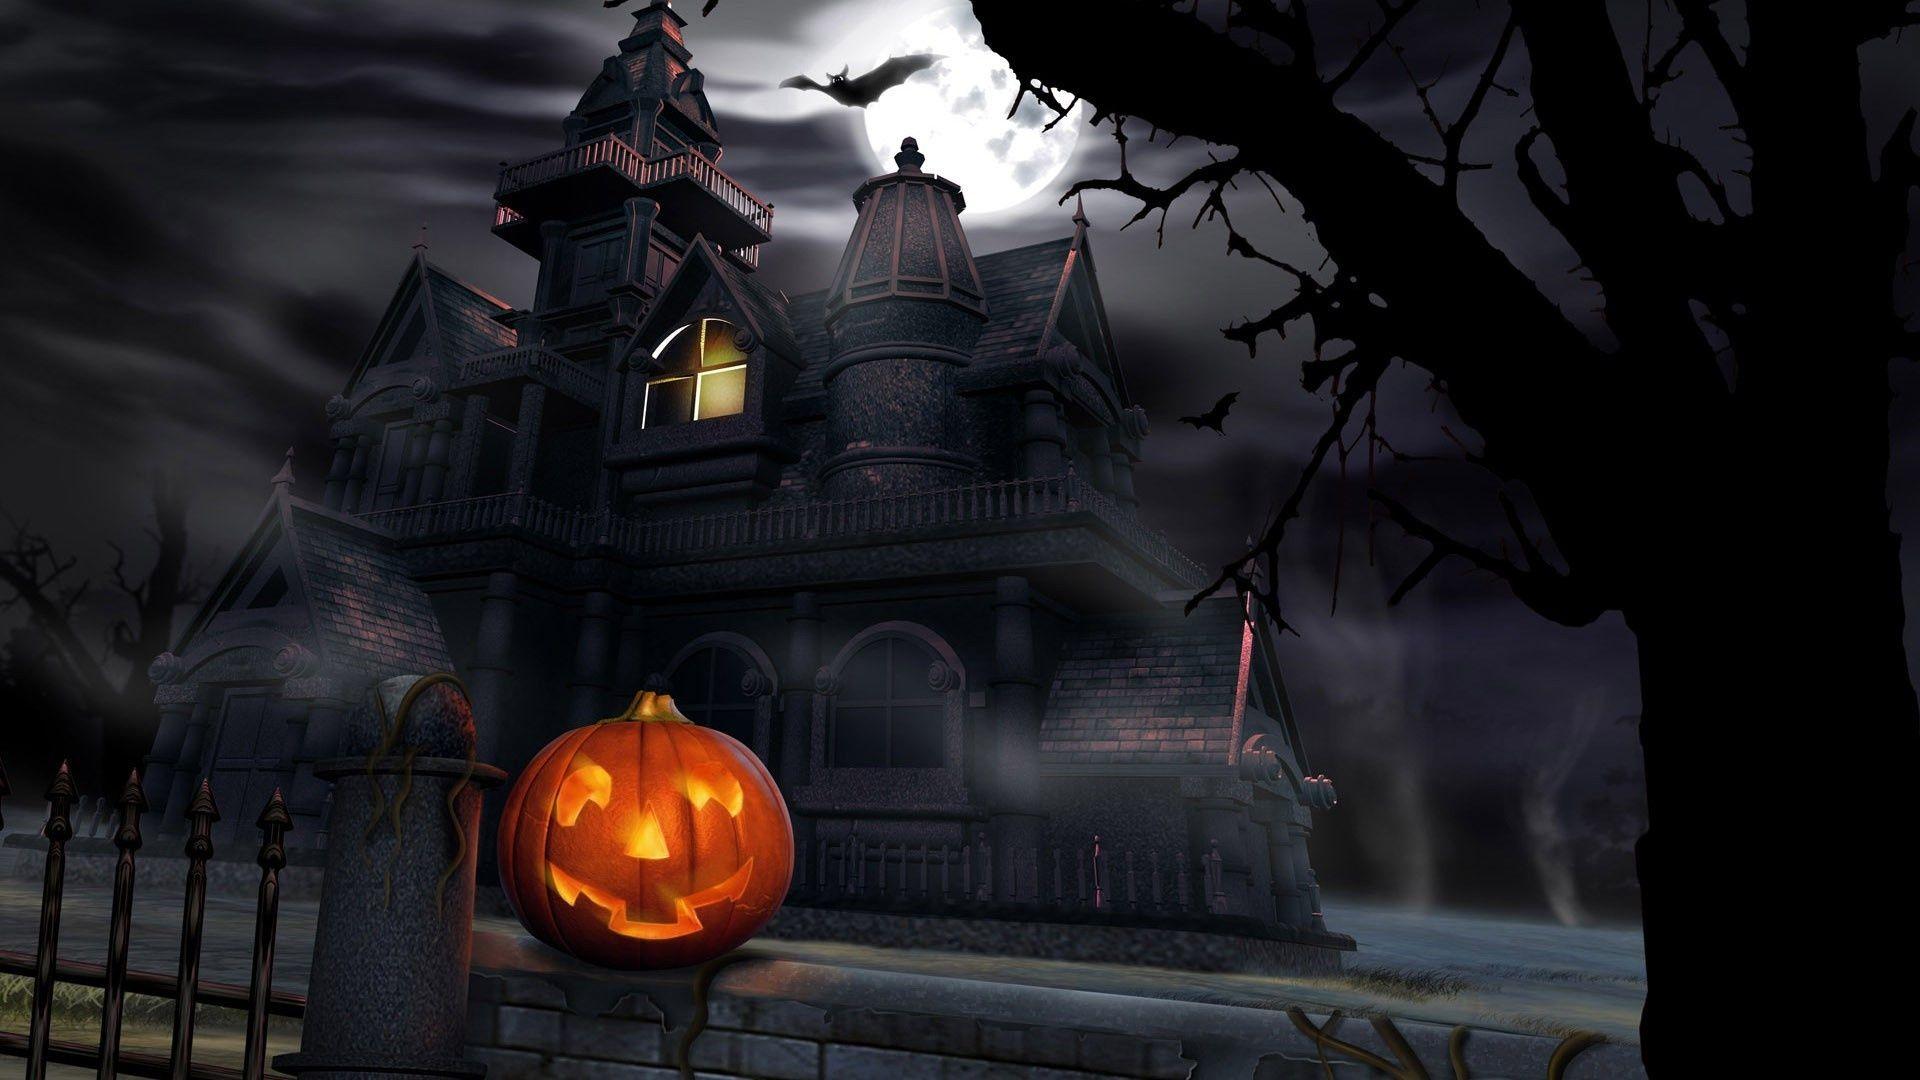 Spooky House In 1920x1080 Resolution Hd Desktop Wallpapers Halloween Pictures Free Halloween Wallpaper Scary Wallpaper